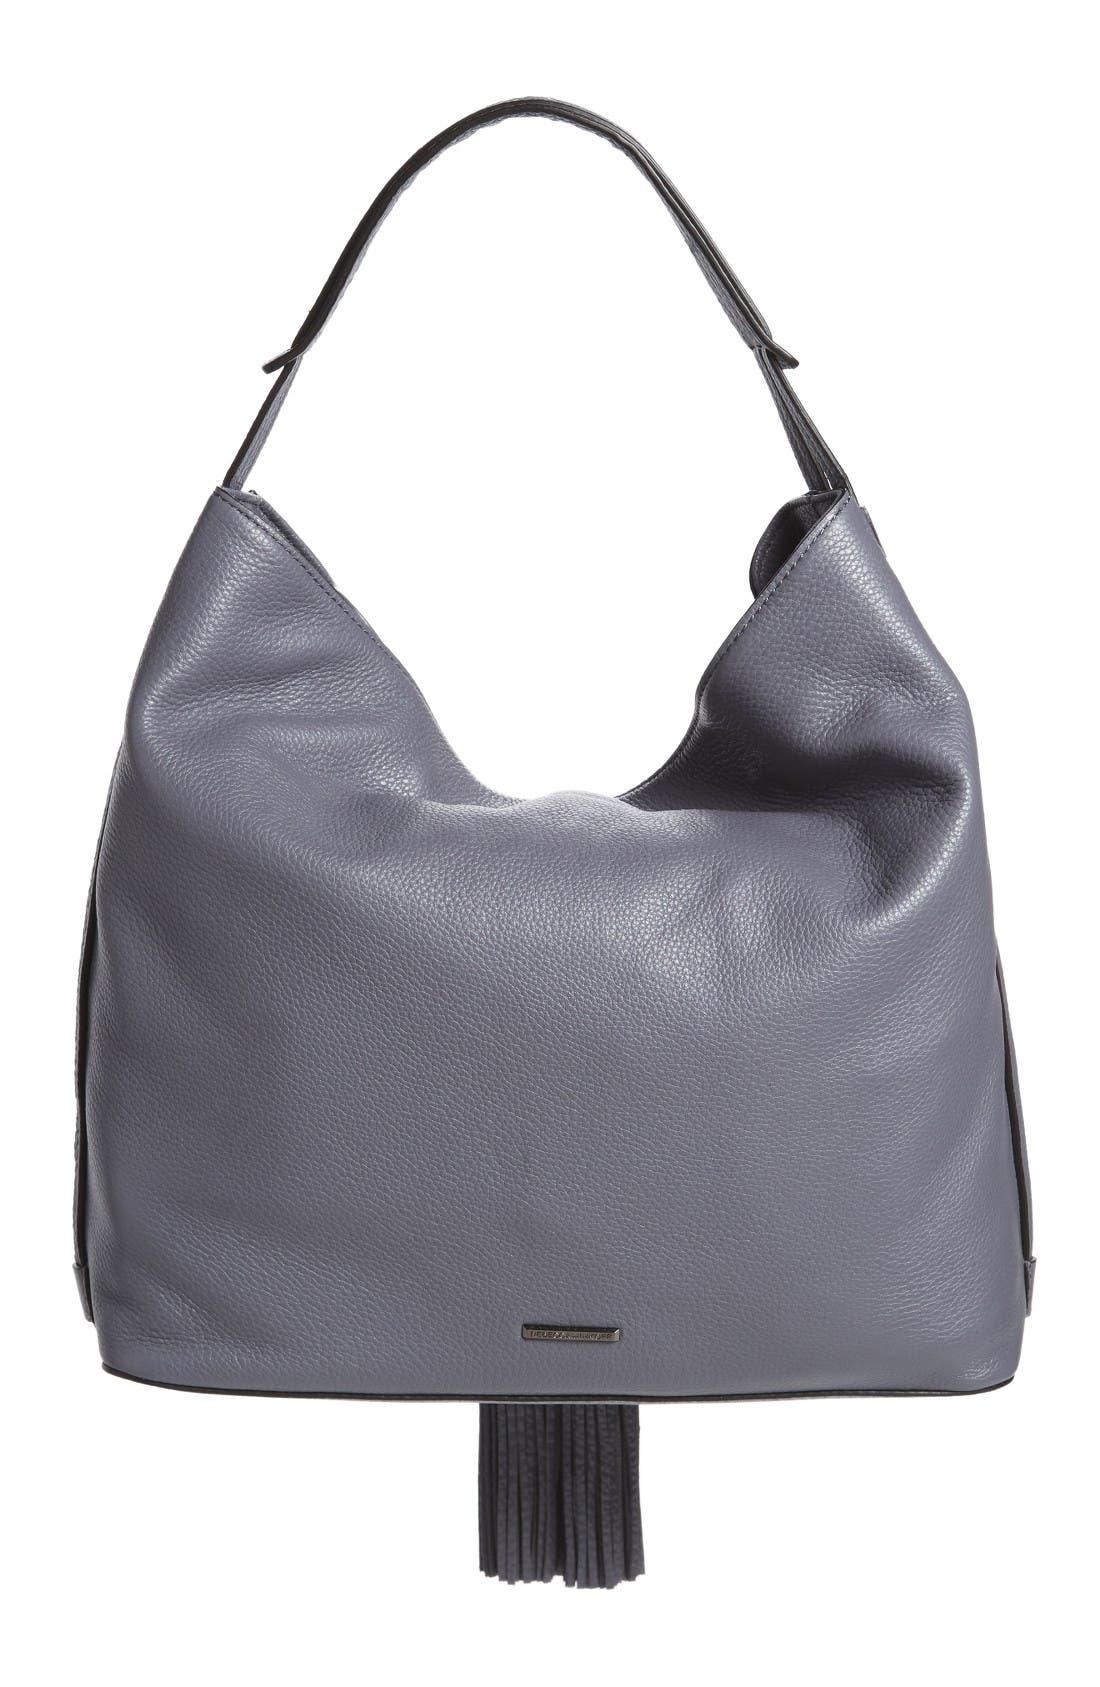 Alternate Image 3  - Rebecca Minkoff Isobel Tassel Leather Hobo